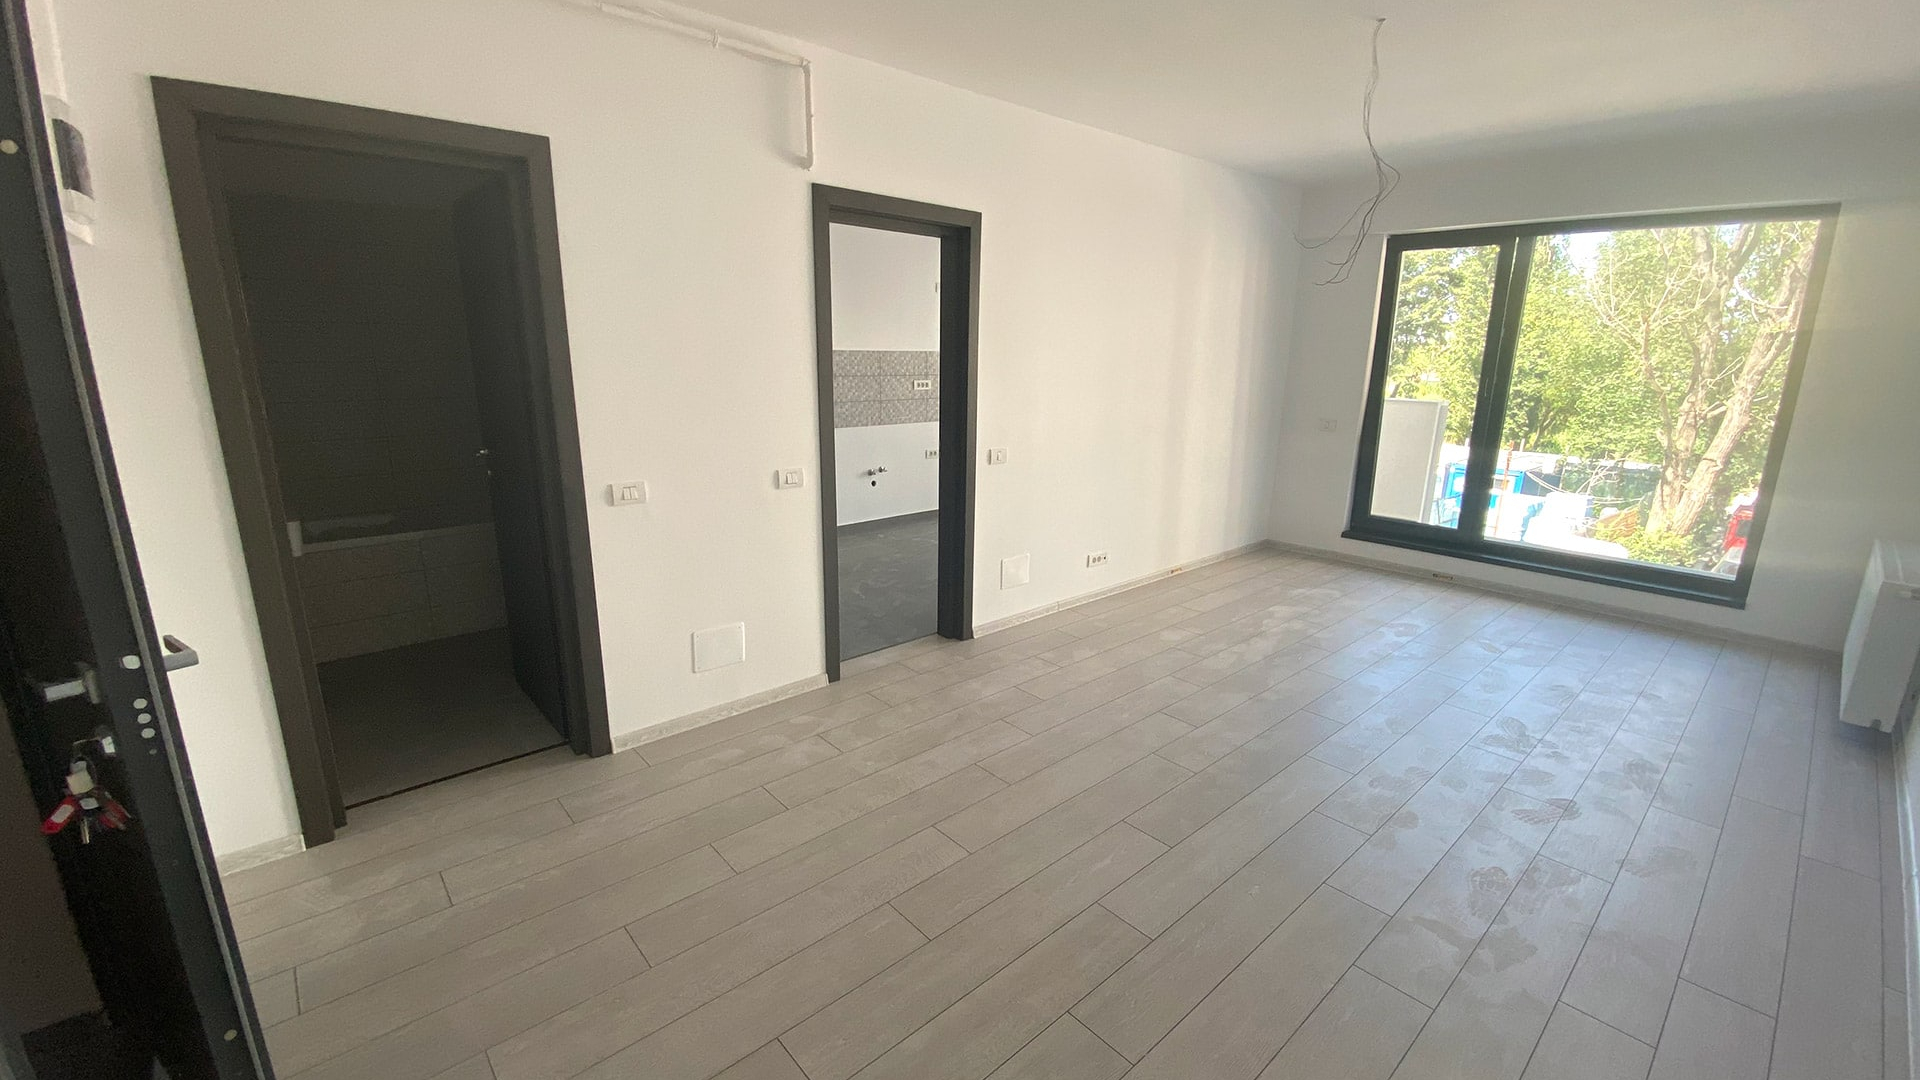 Stadiu executie Uverturii Residence 12 August 2020 - Apartamente si garsoniere de vanzare Militari, Gorjului - 3